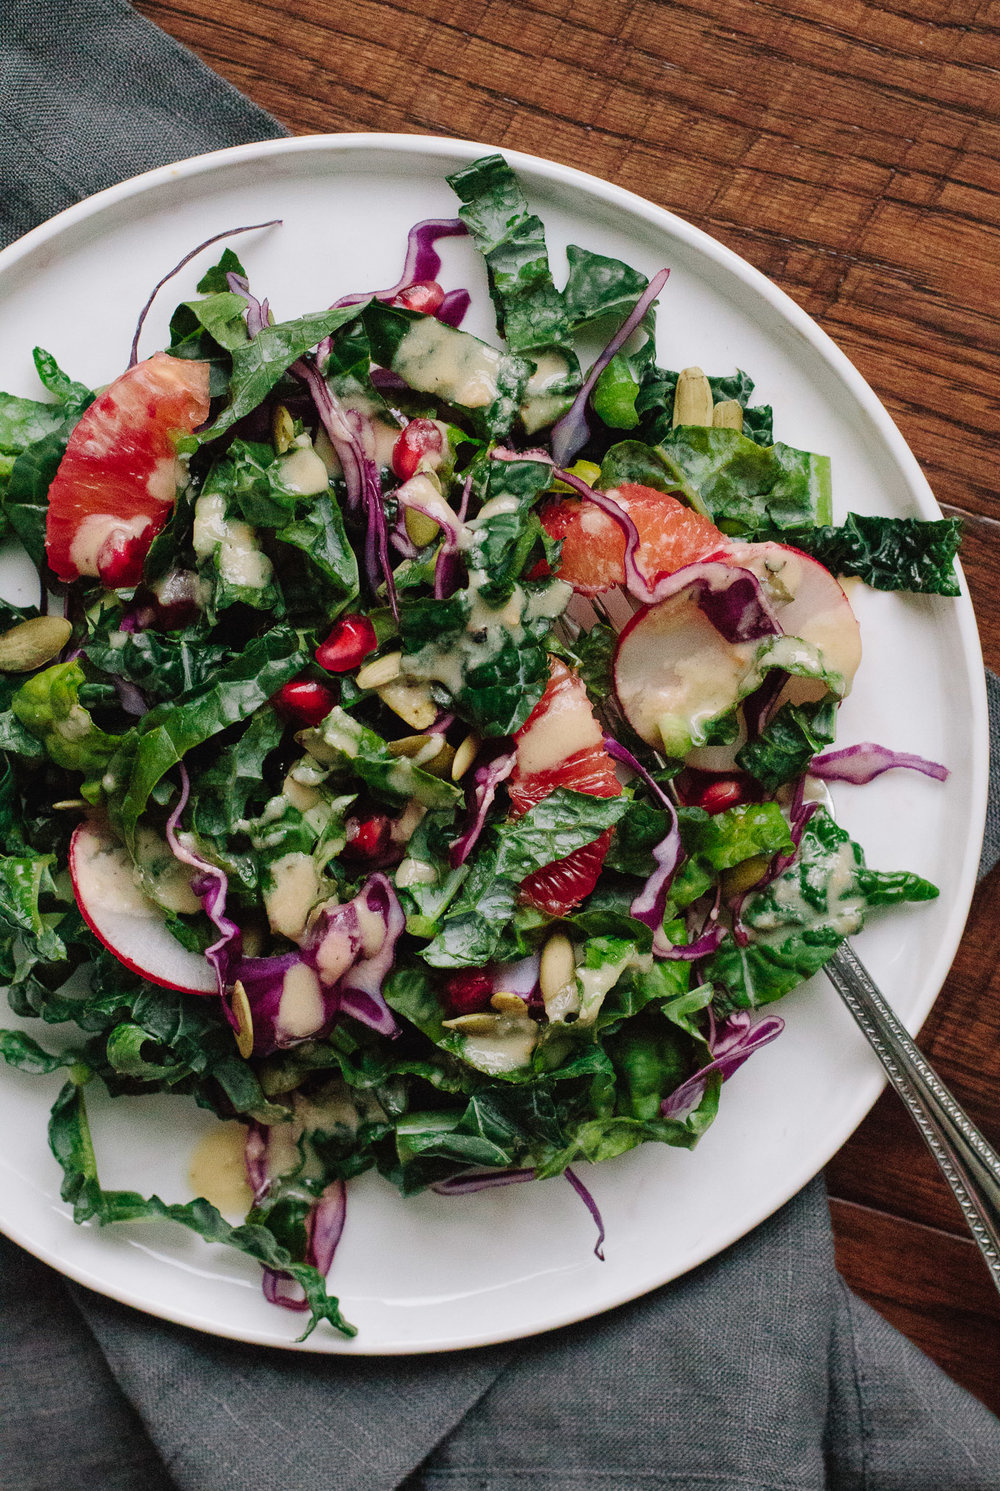 Winter-Citrus-Kale-Salad-10-of-11.jpg